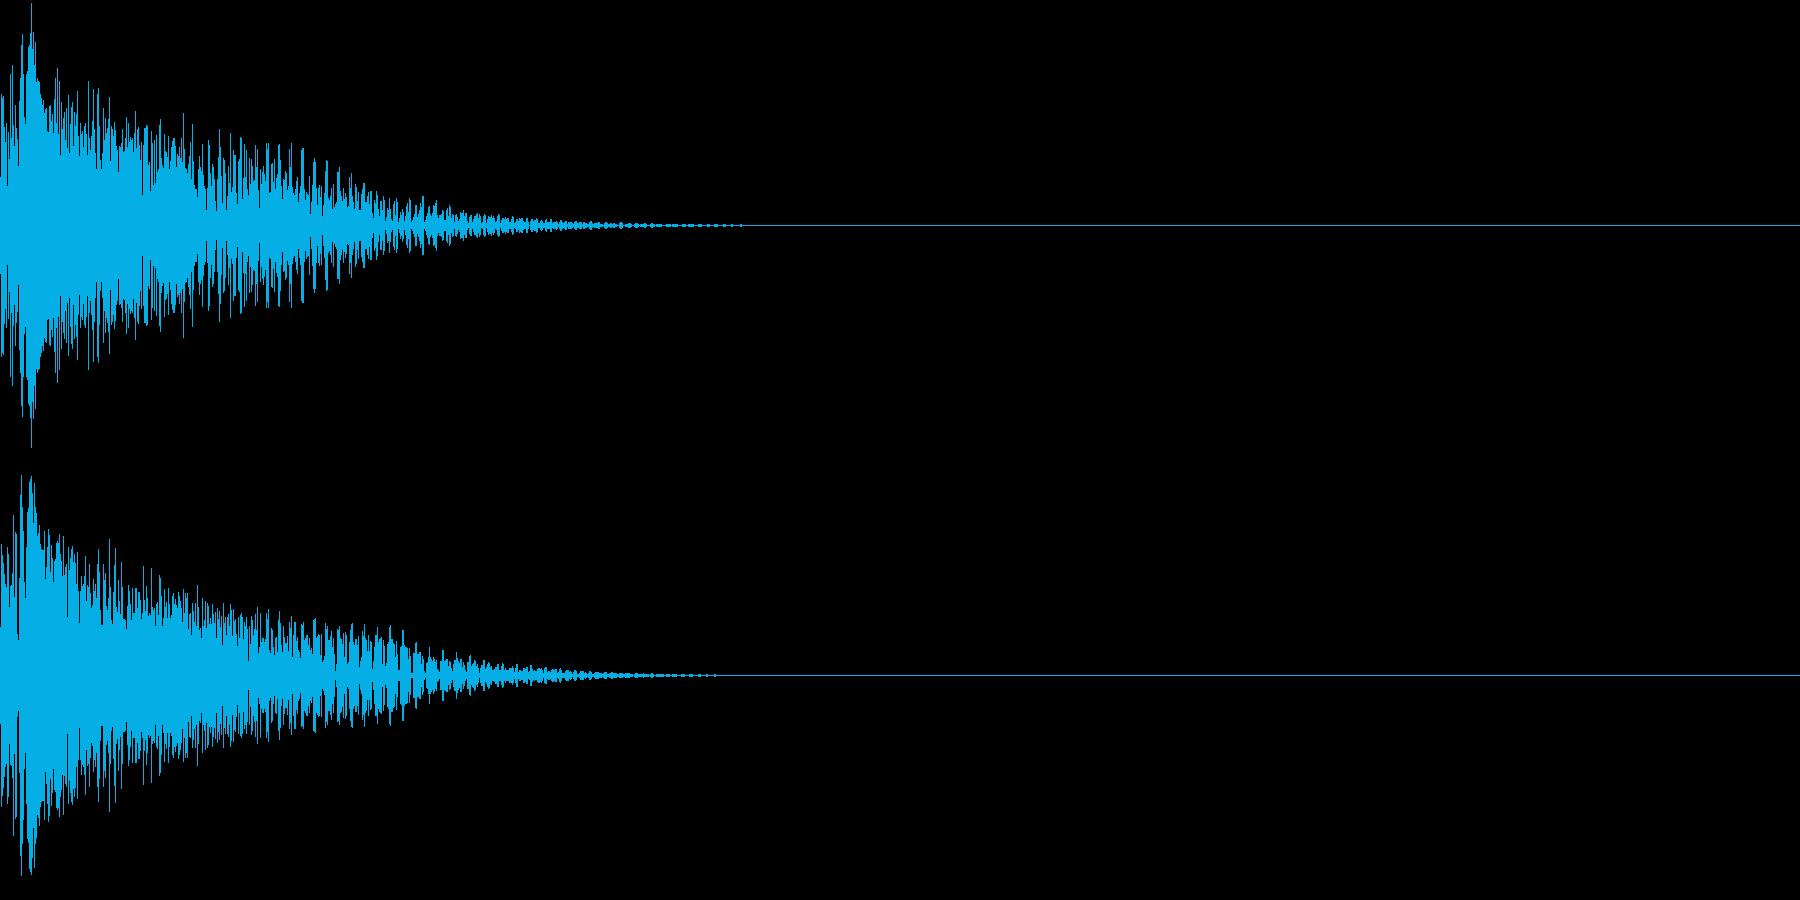 Weapon ビーム小銃 レーザーガンの再生済みの波形